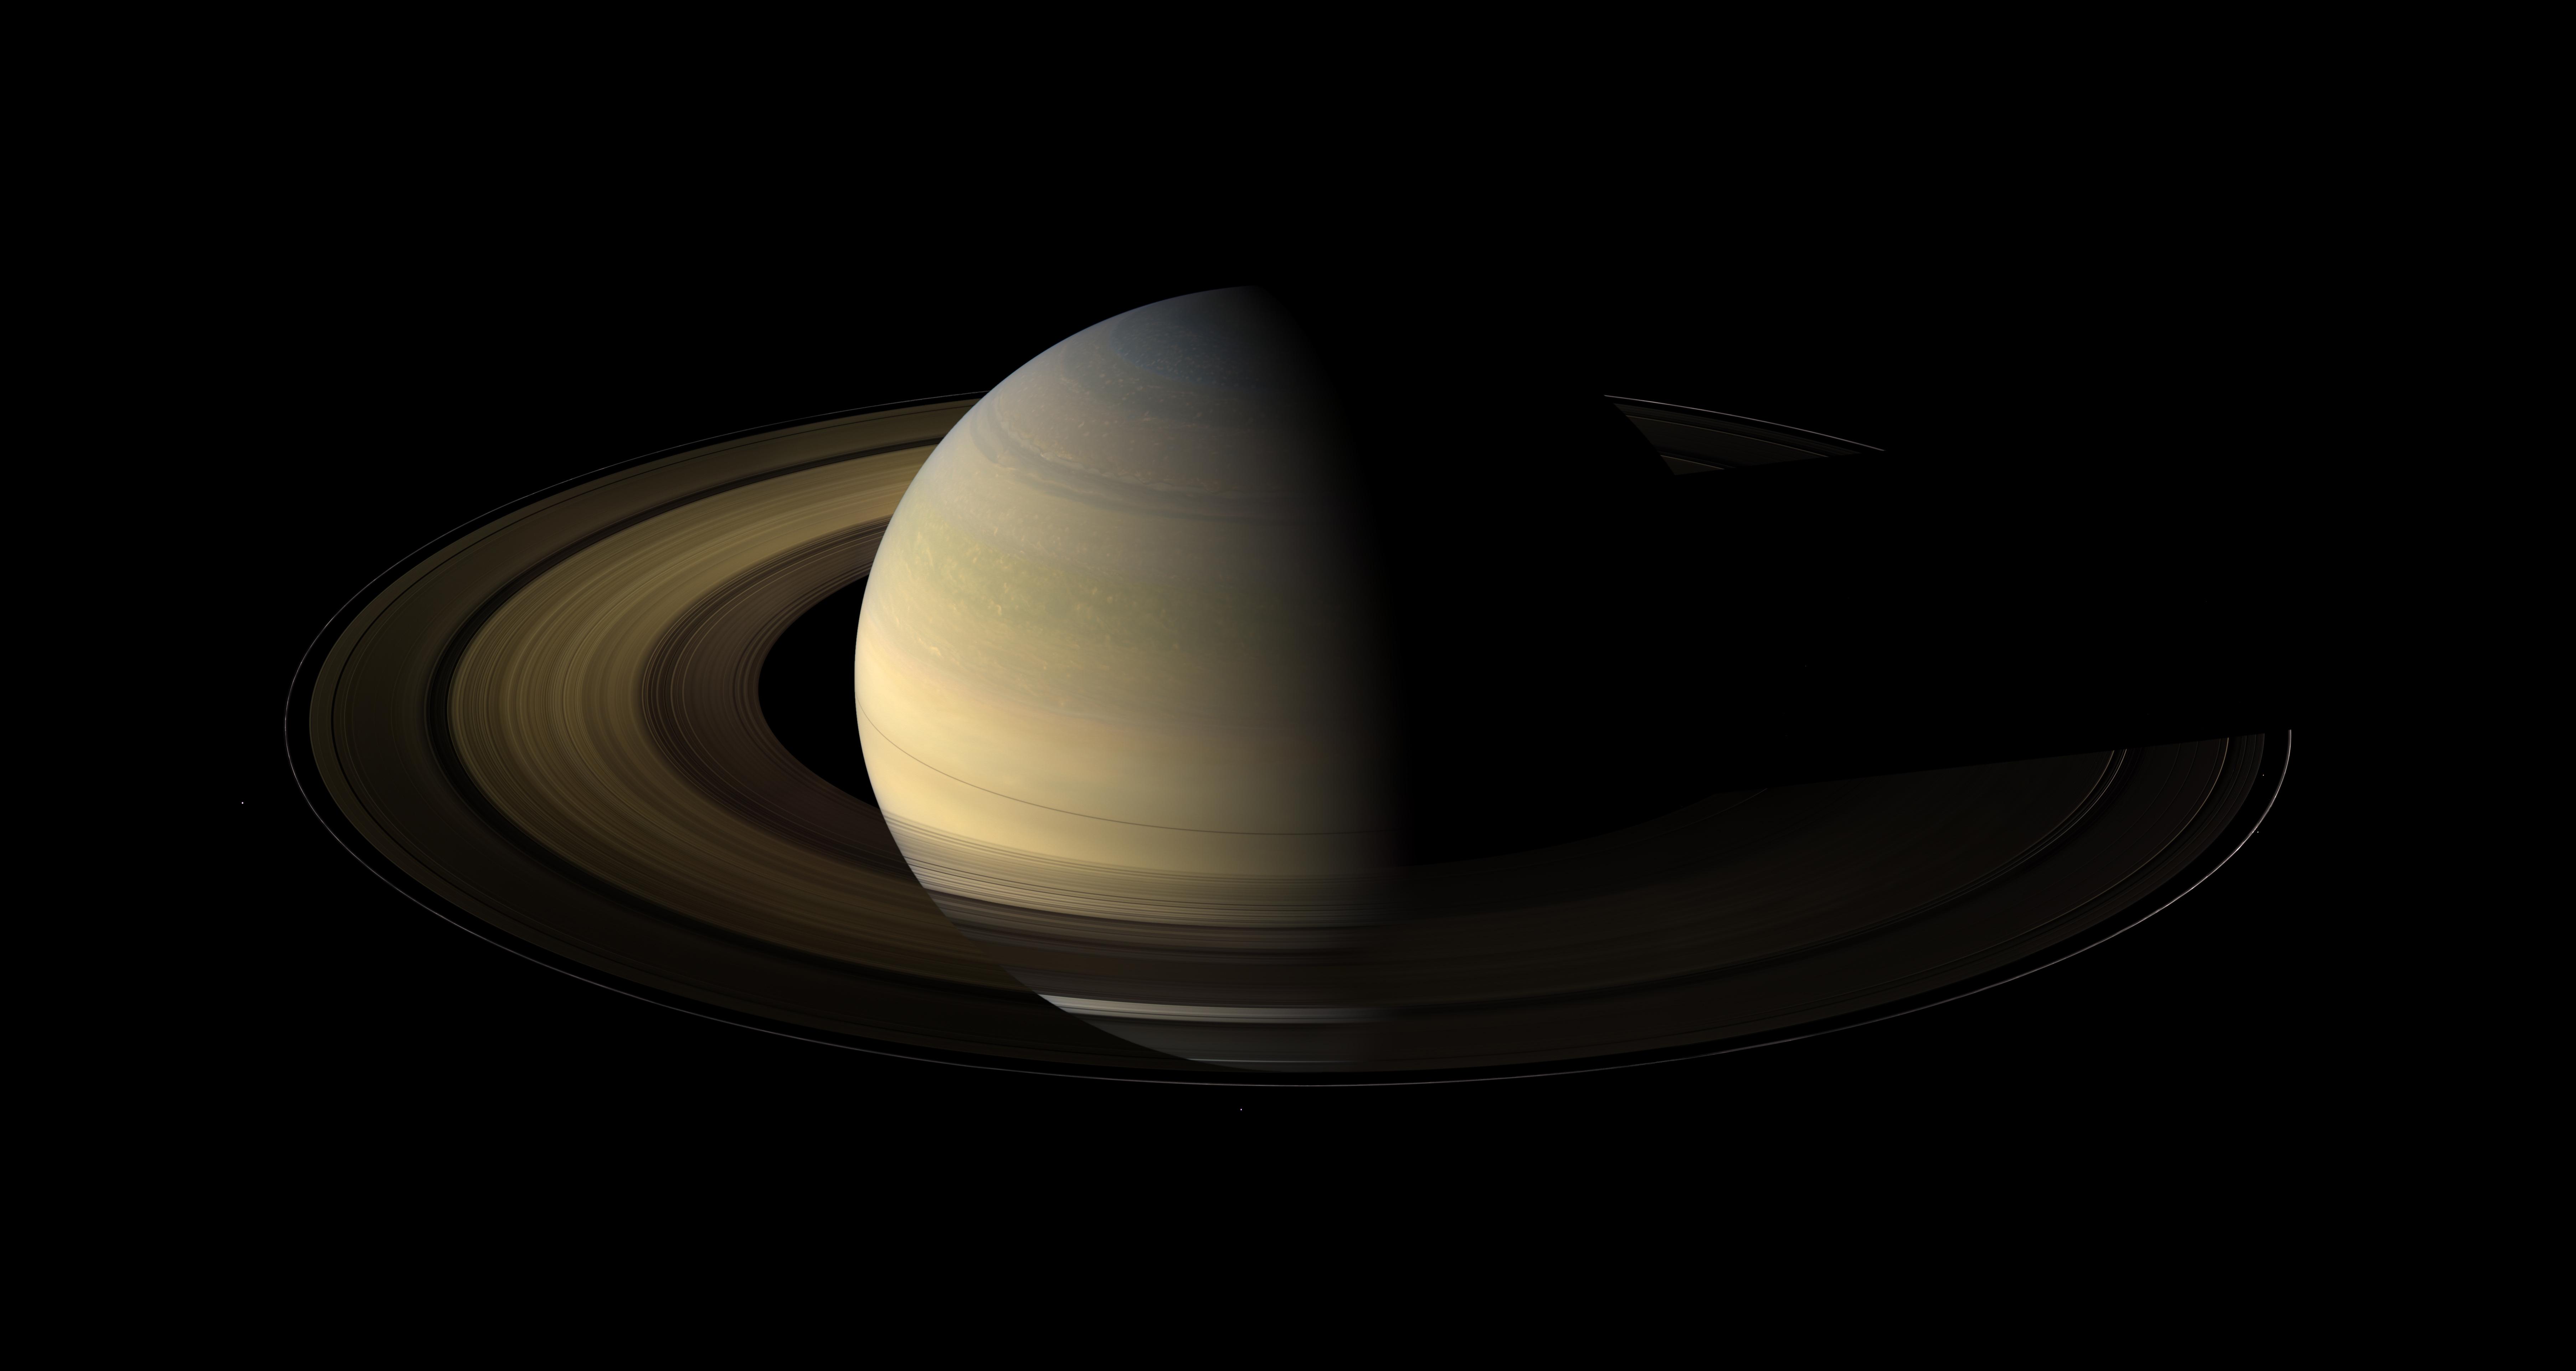 planets near saturn - photo #23